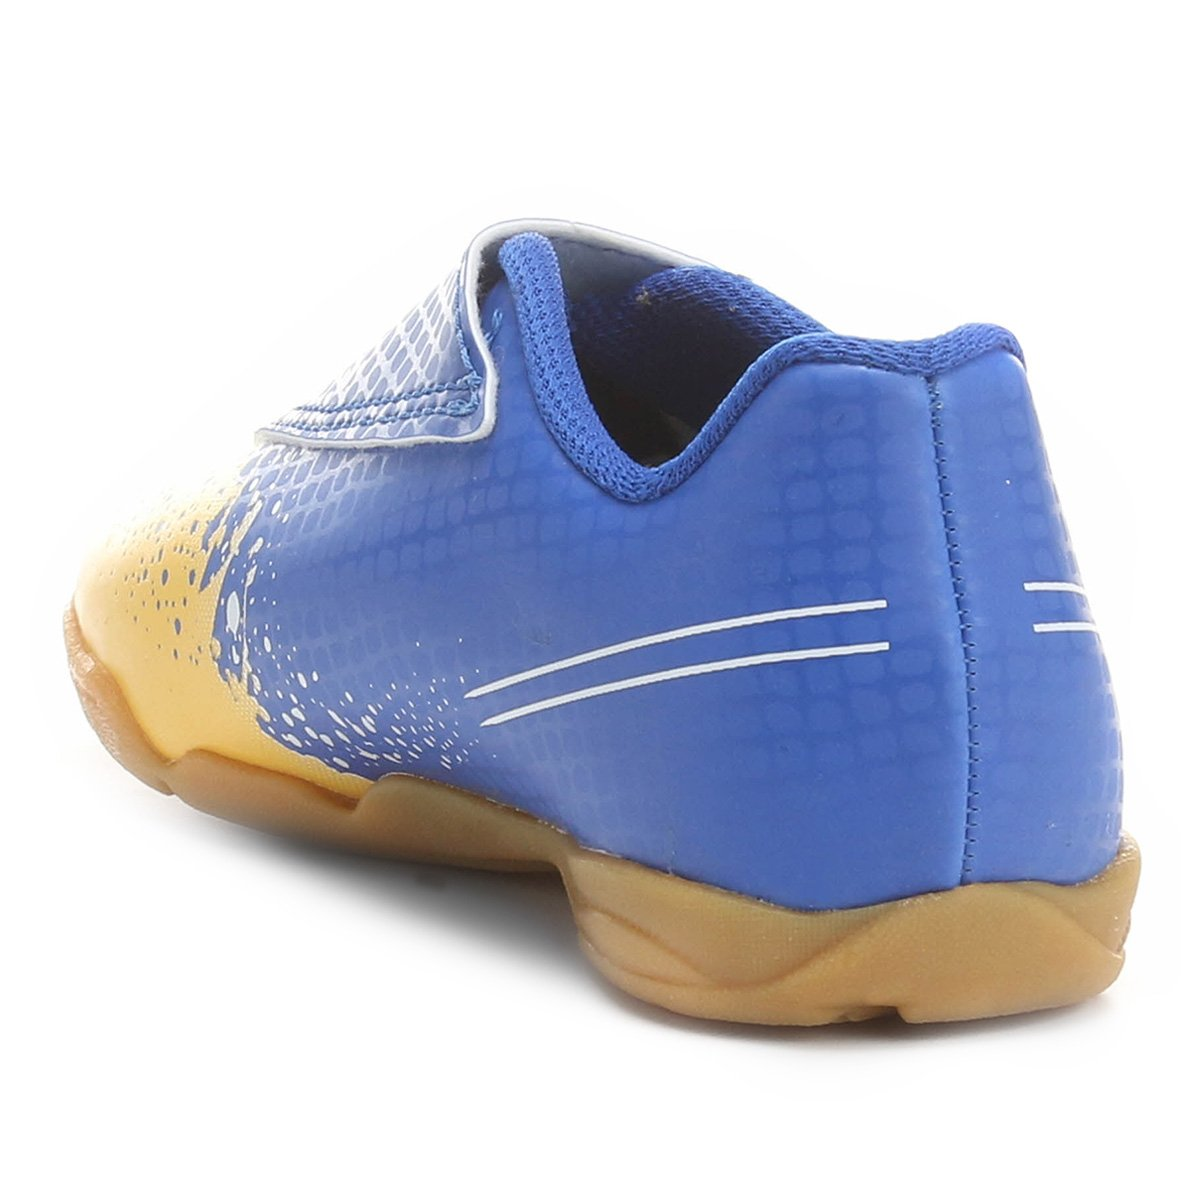 Chuteira Futsal Infantil Umbro Wave - Azul e amarelo - Compre Agora ... d62a01de3d3ec